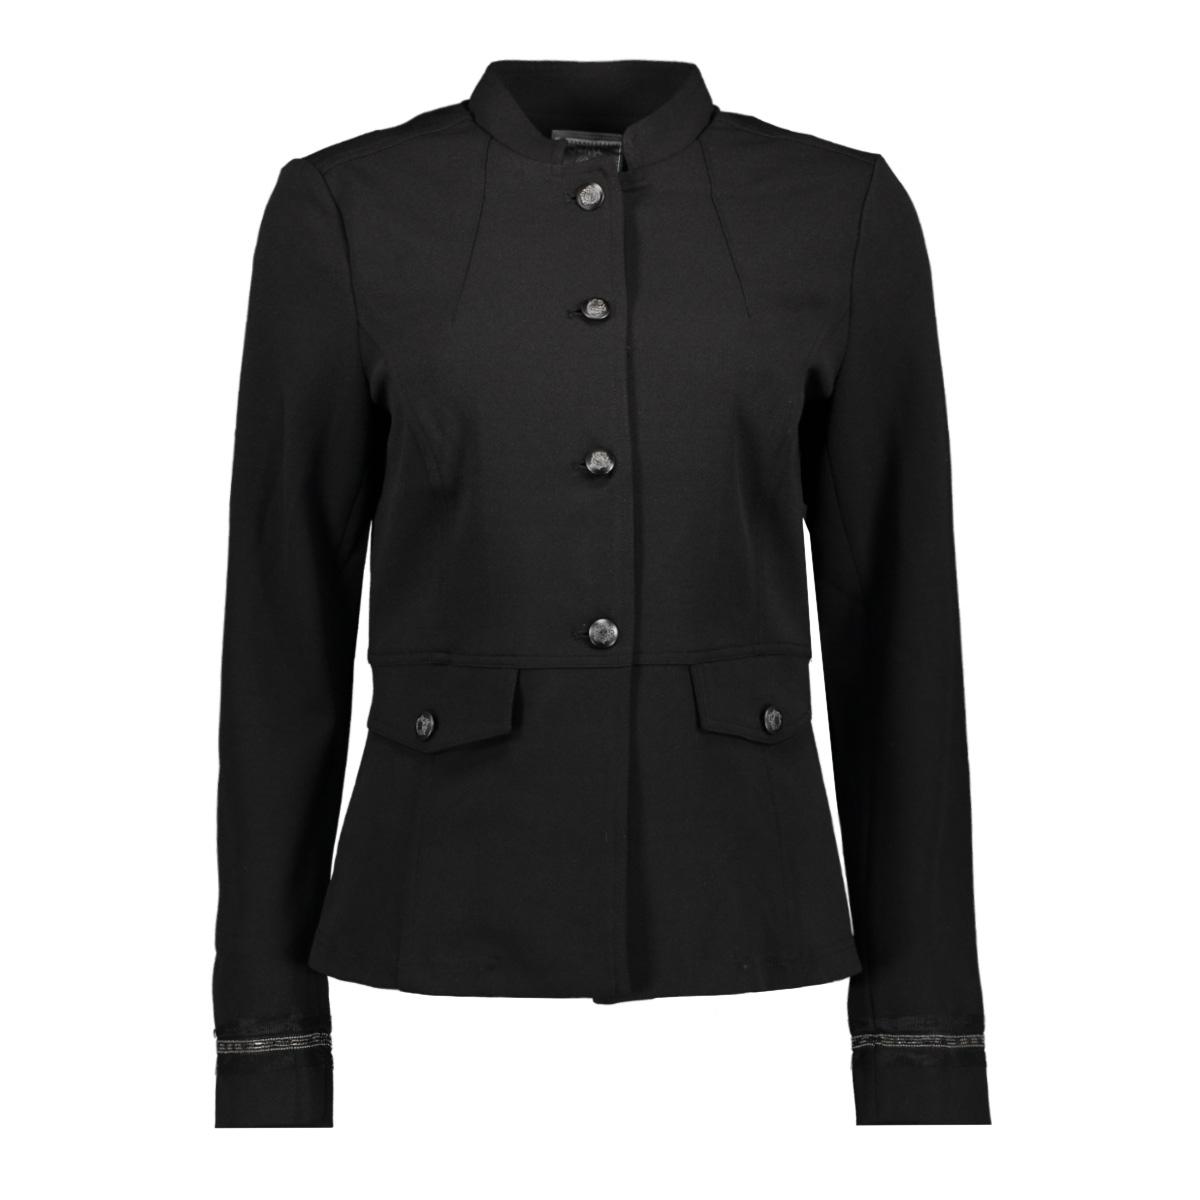 jacket with chain at cuff 95524 10 geisha blazer black